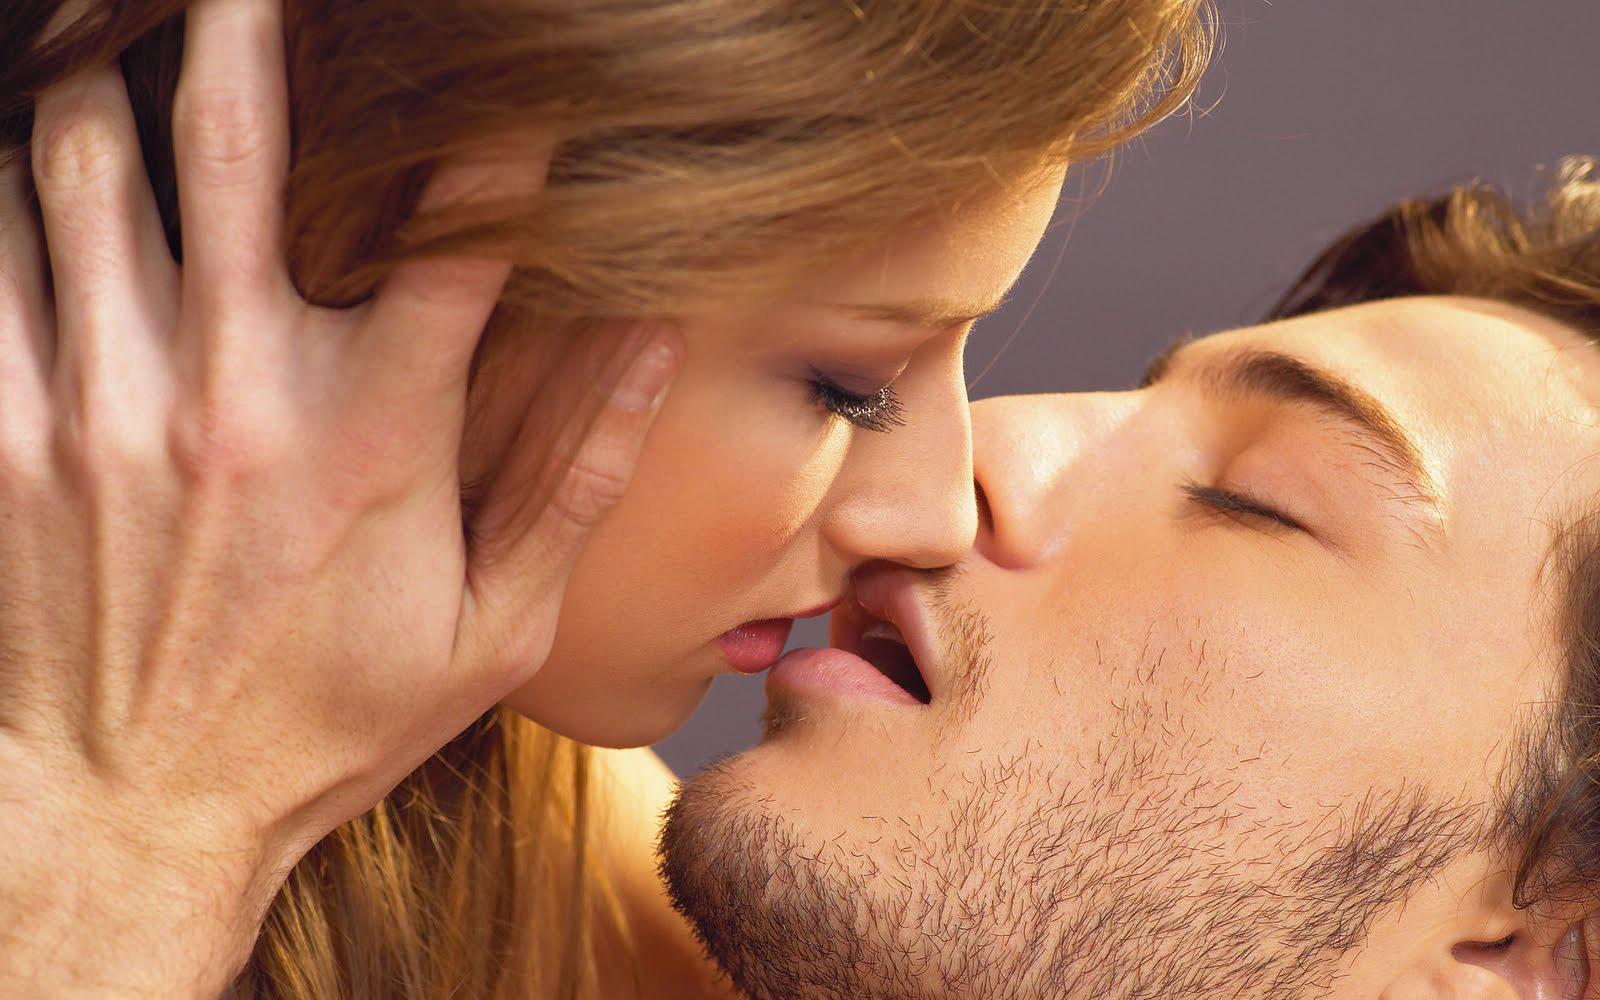 sanjati poljubac